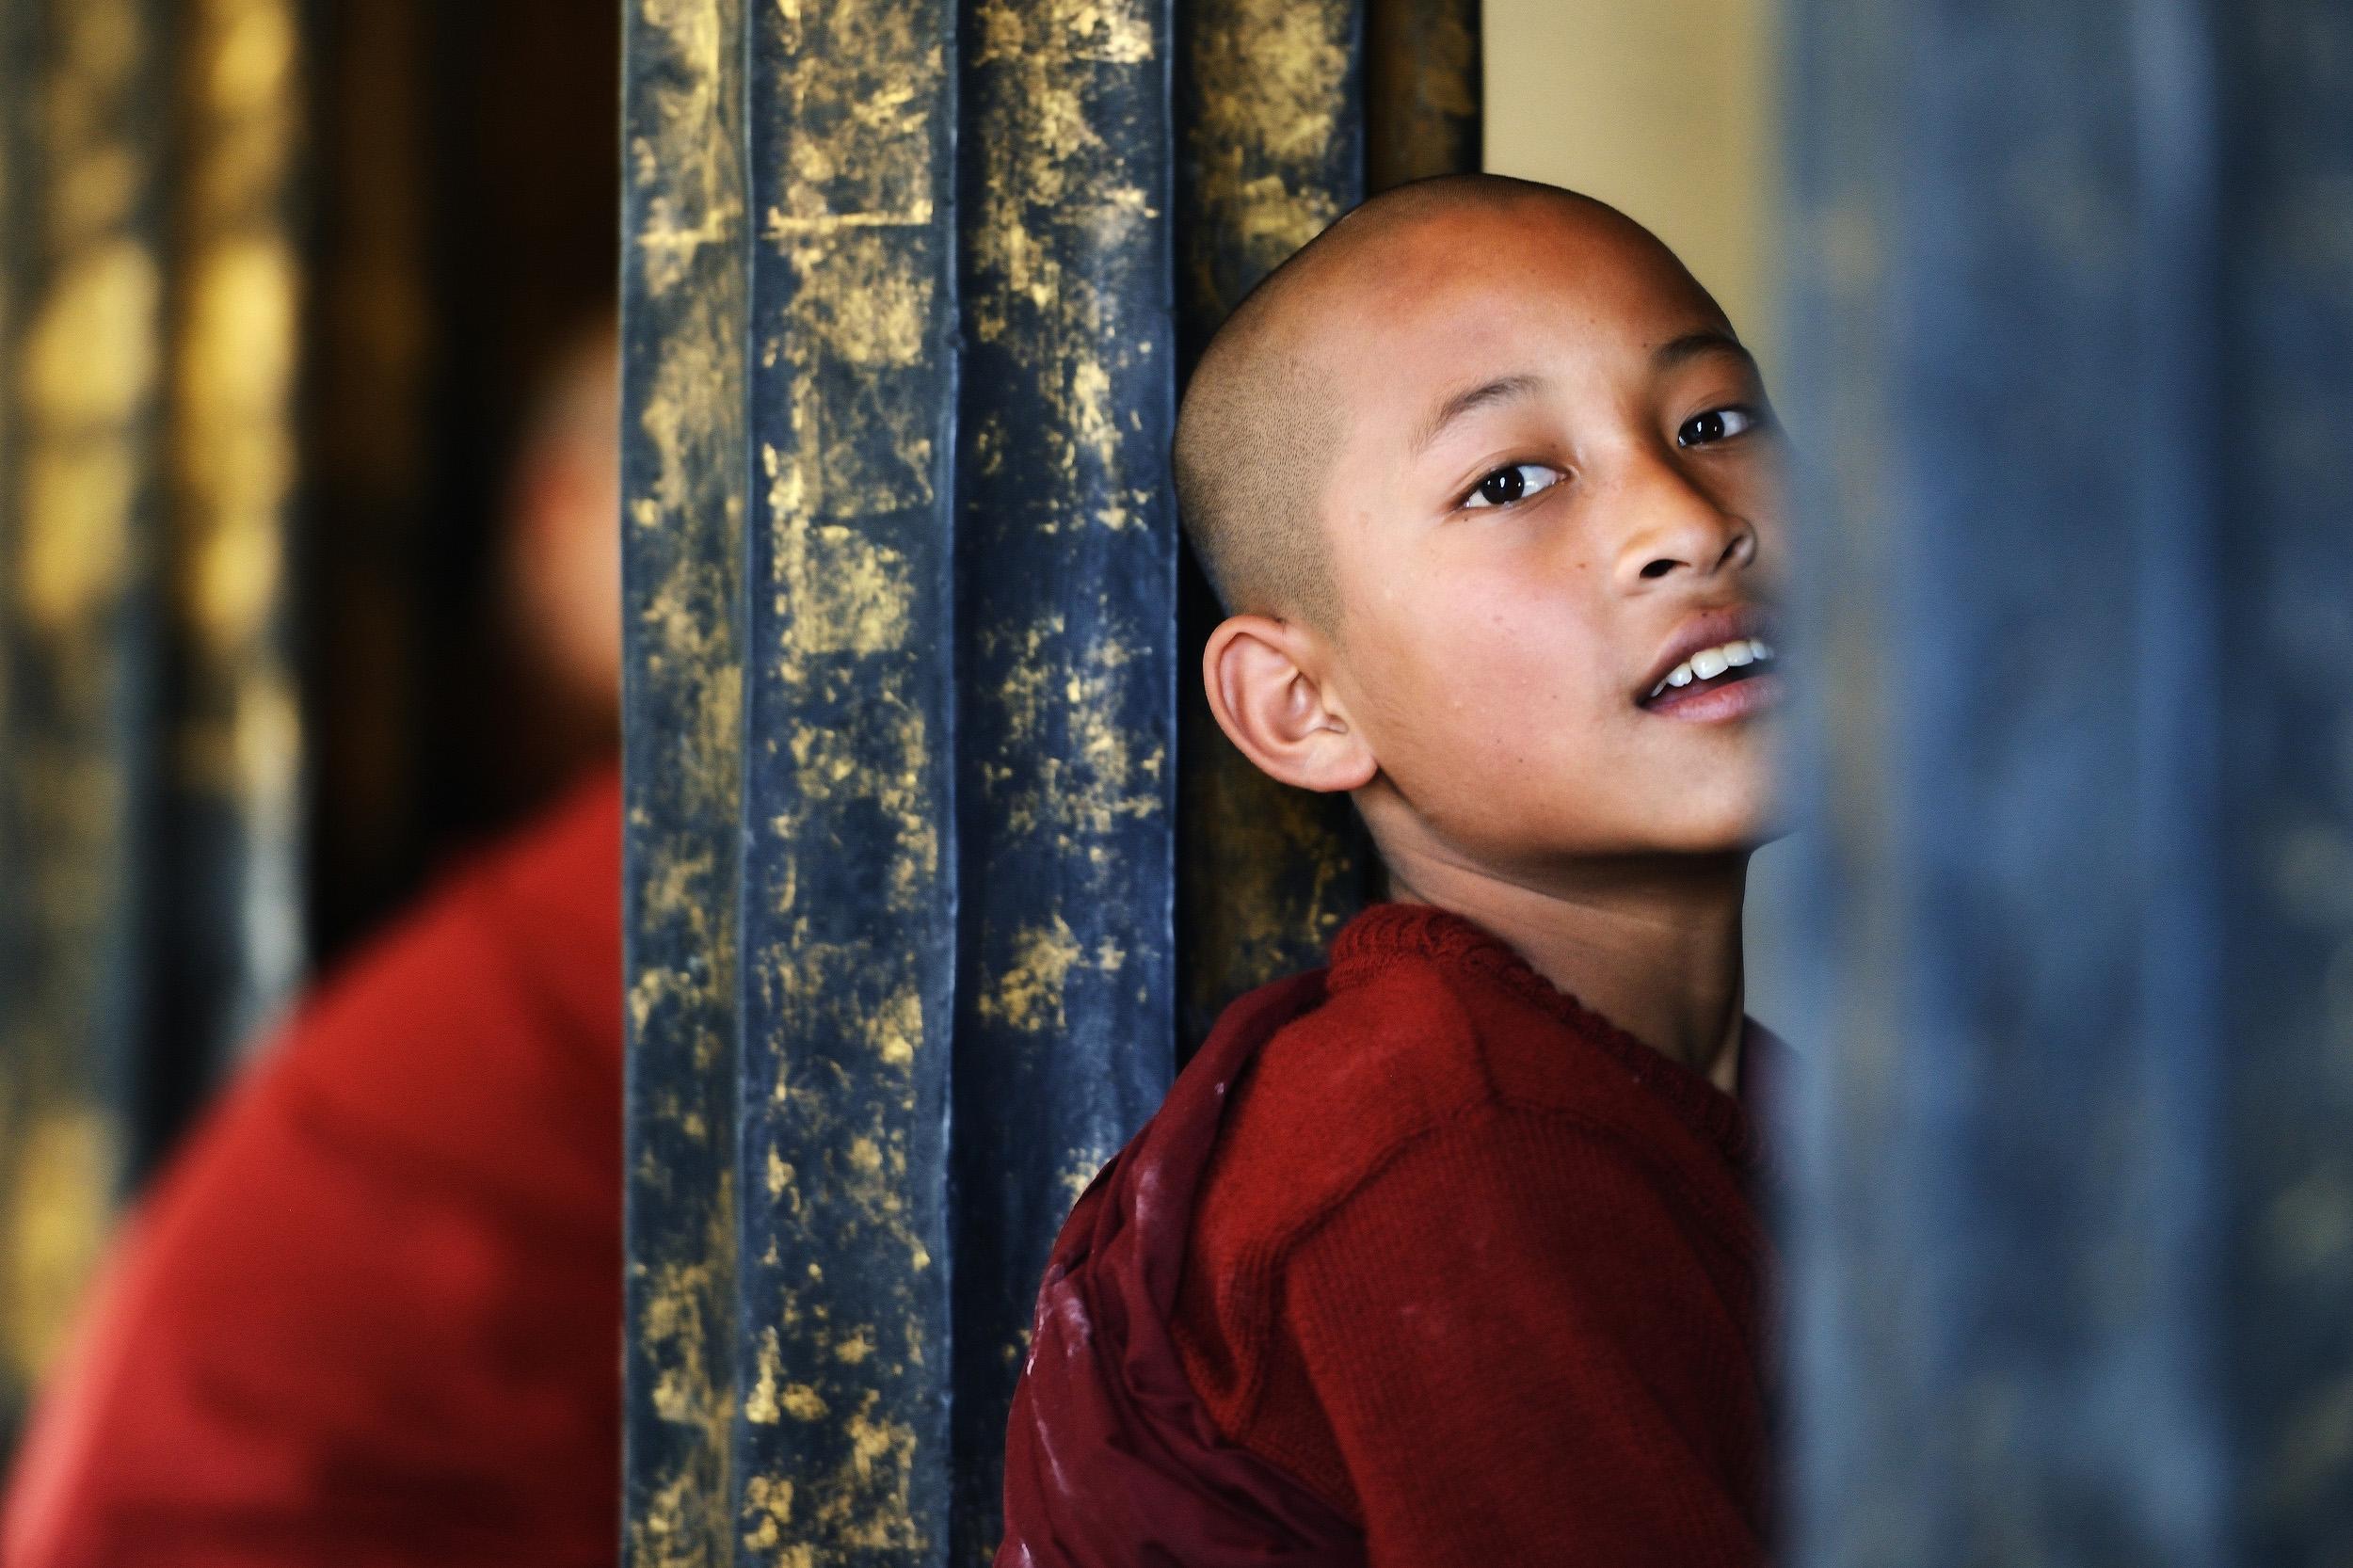 Shwe Yaunghwe Kyaung Monastery   A novice monk in Shwe Yaunghwe Kyaung, Nuang Shwe, Burma